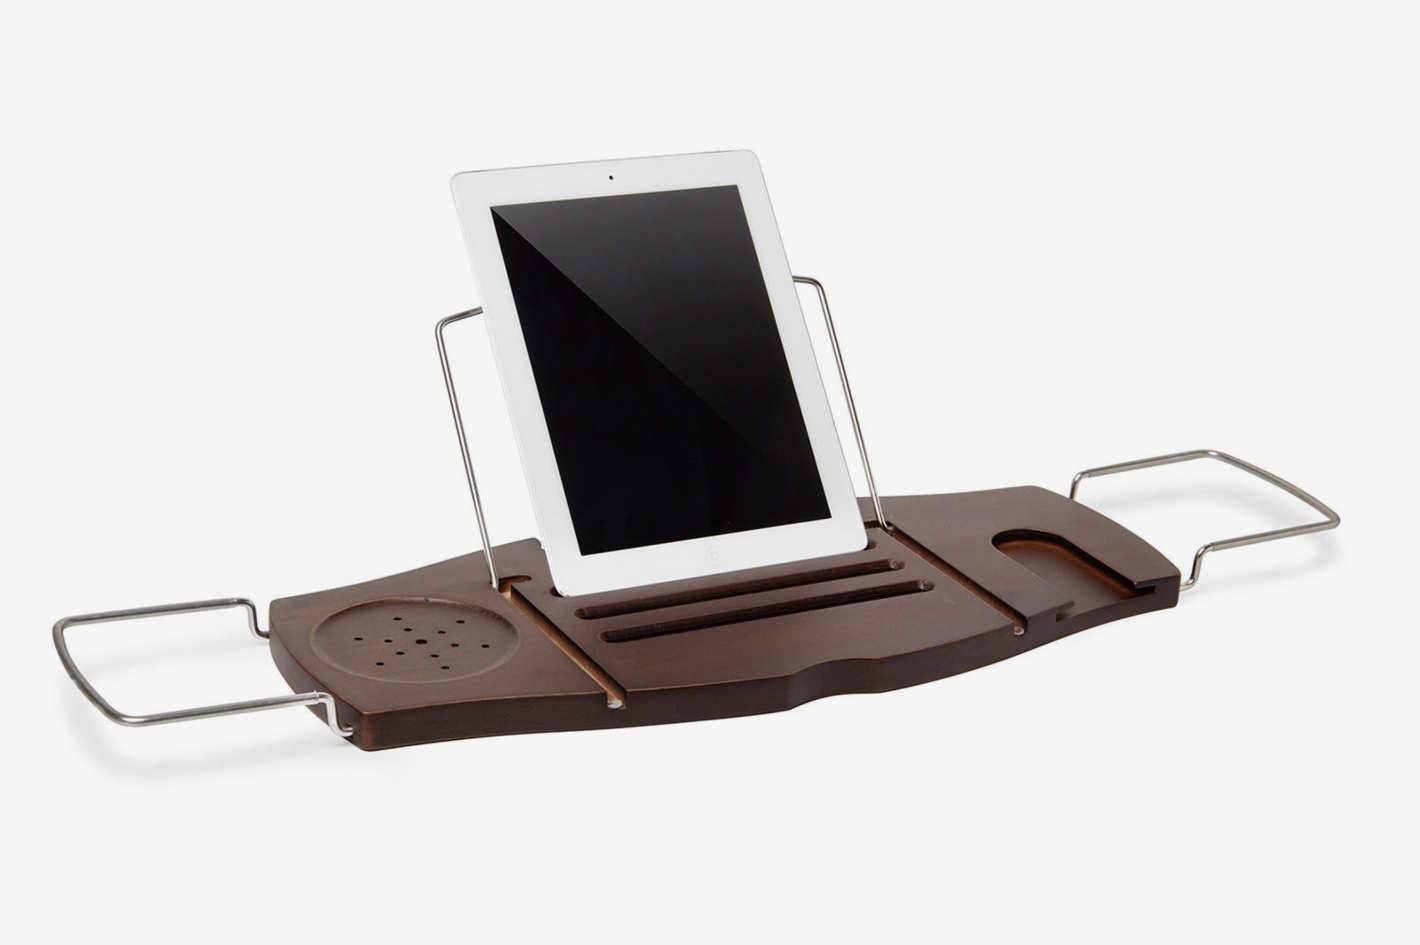 Umbra Bathtub Caddy with iPad Stand